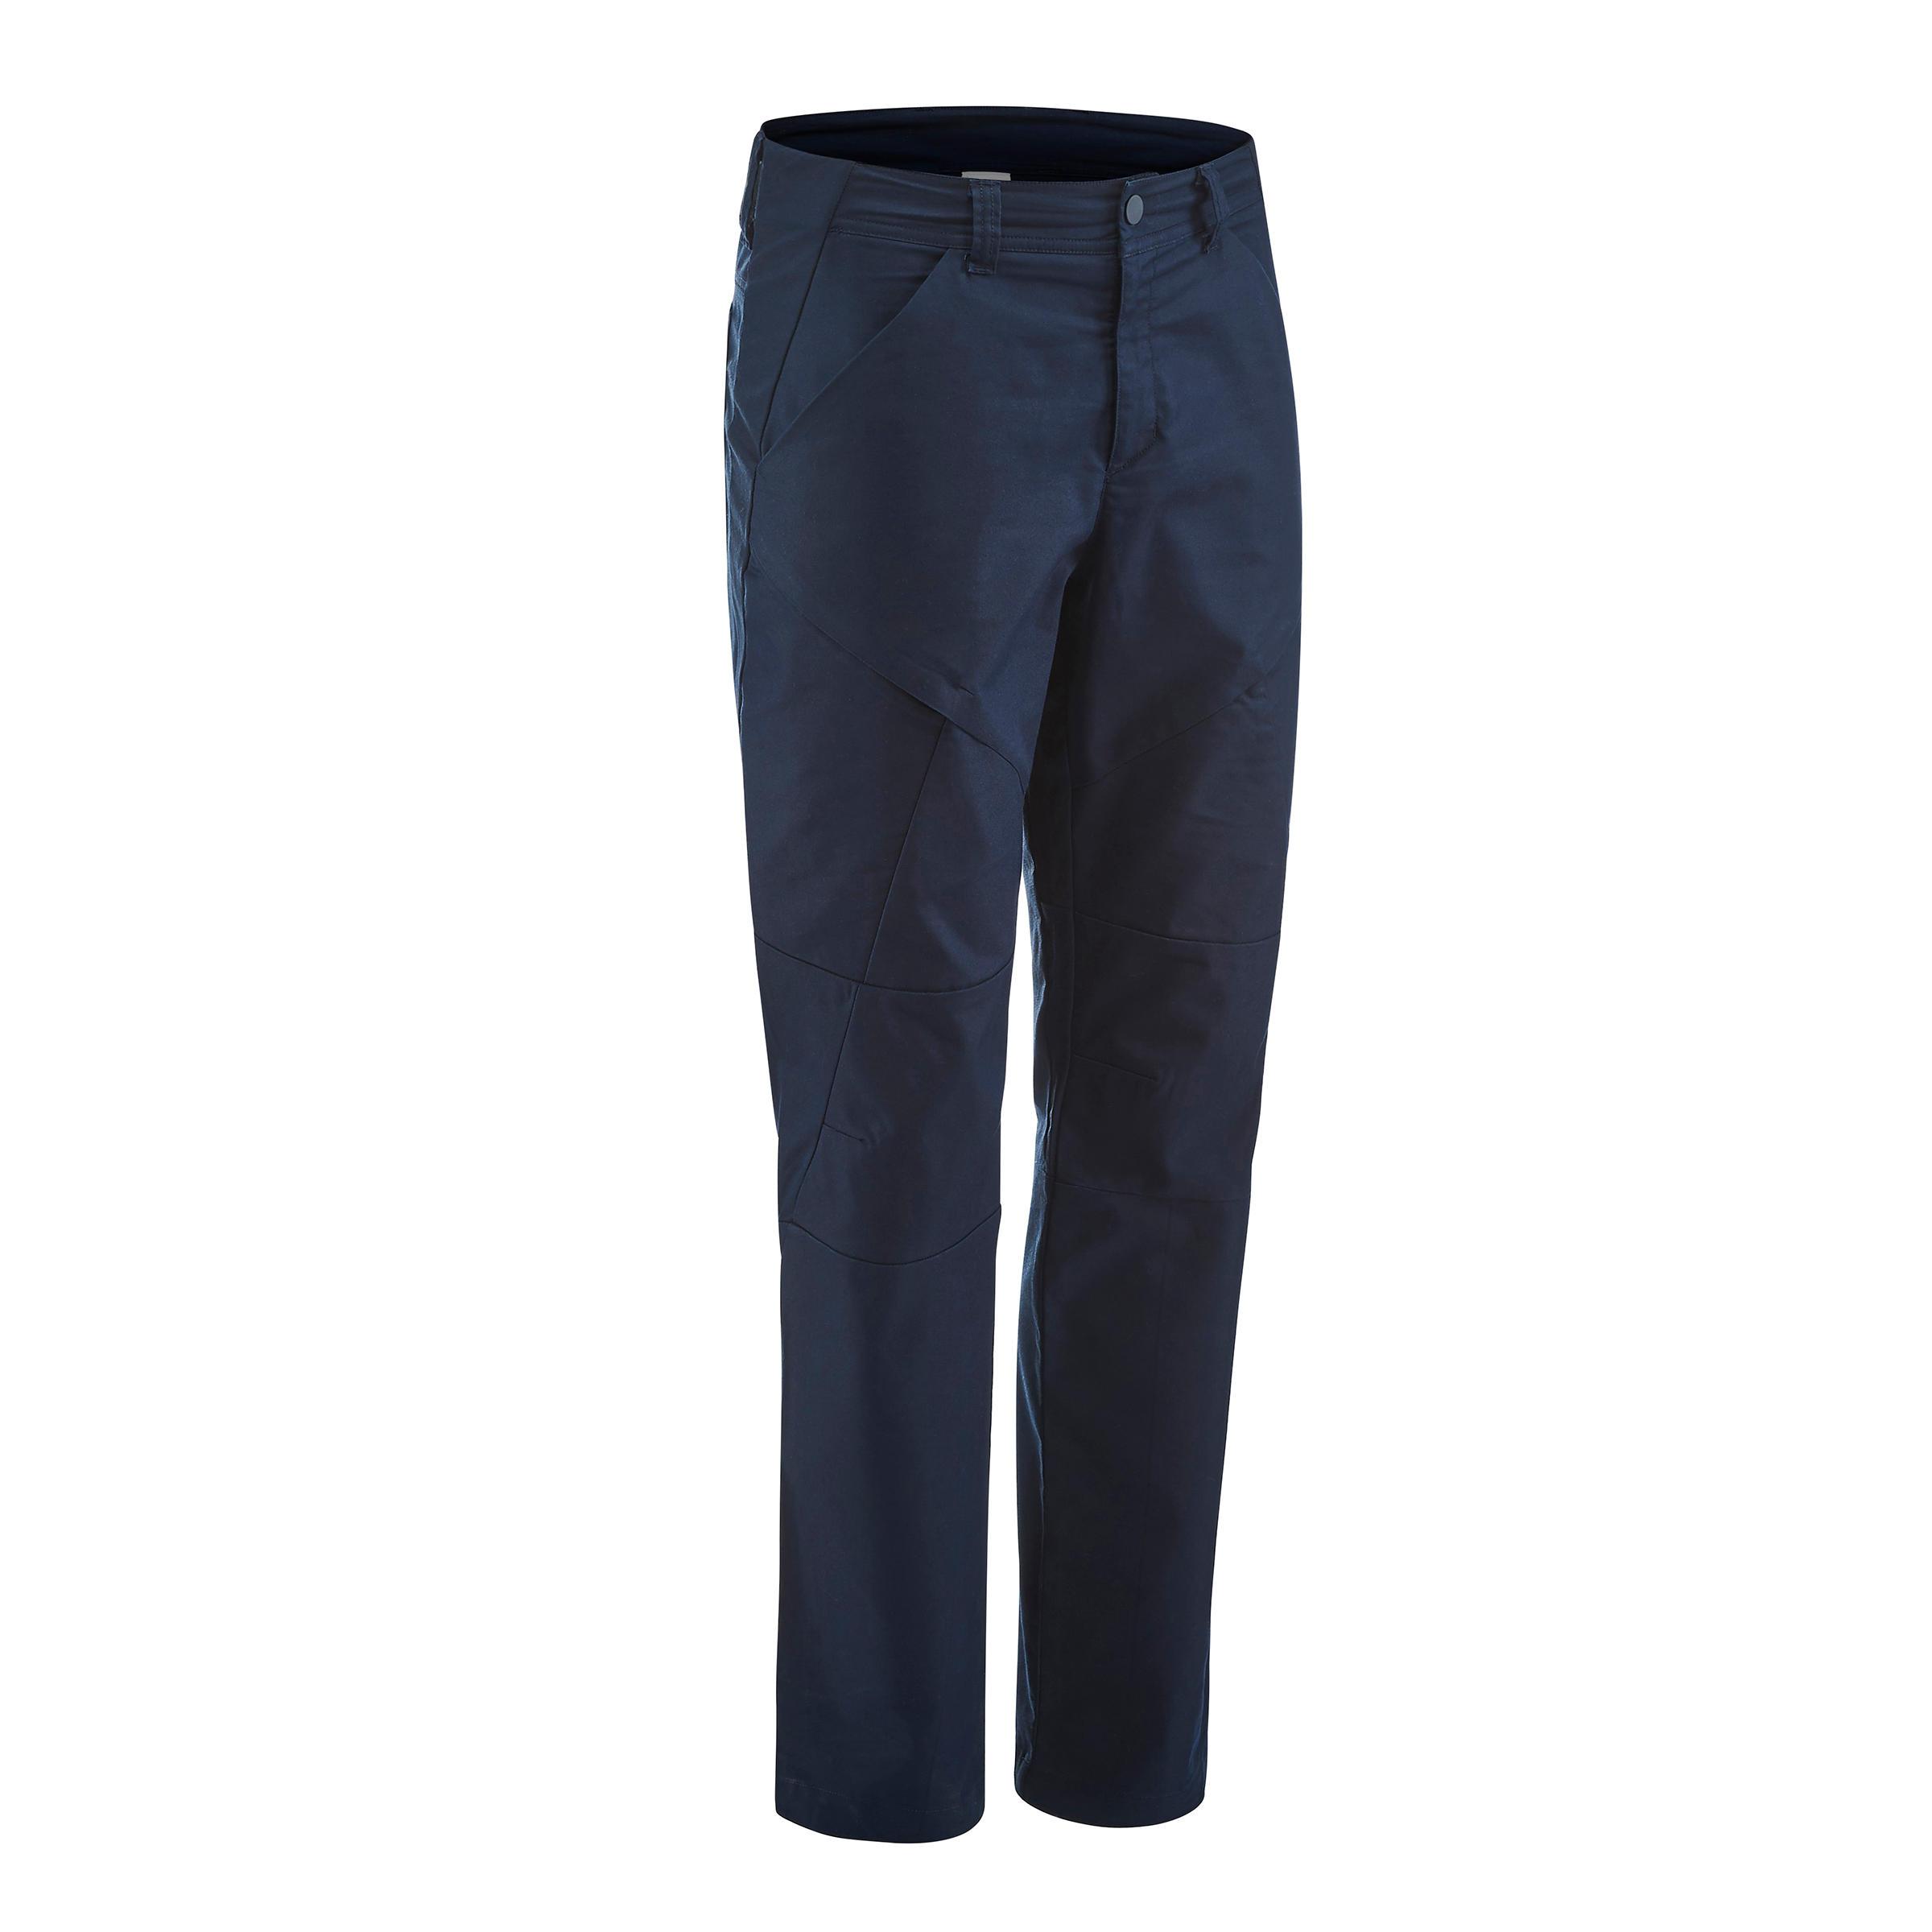 Pantalon NH500 REGULAR bărbaţi